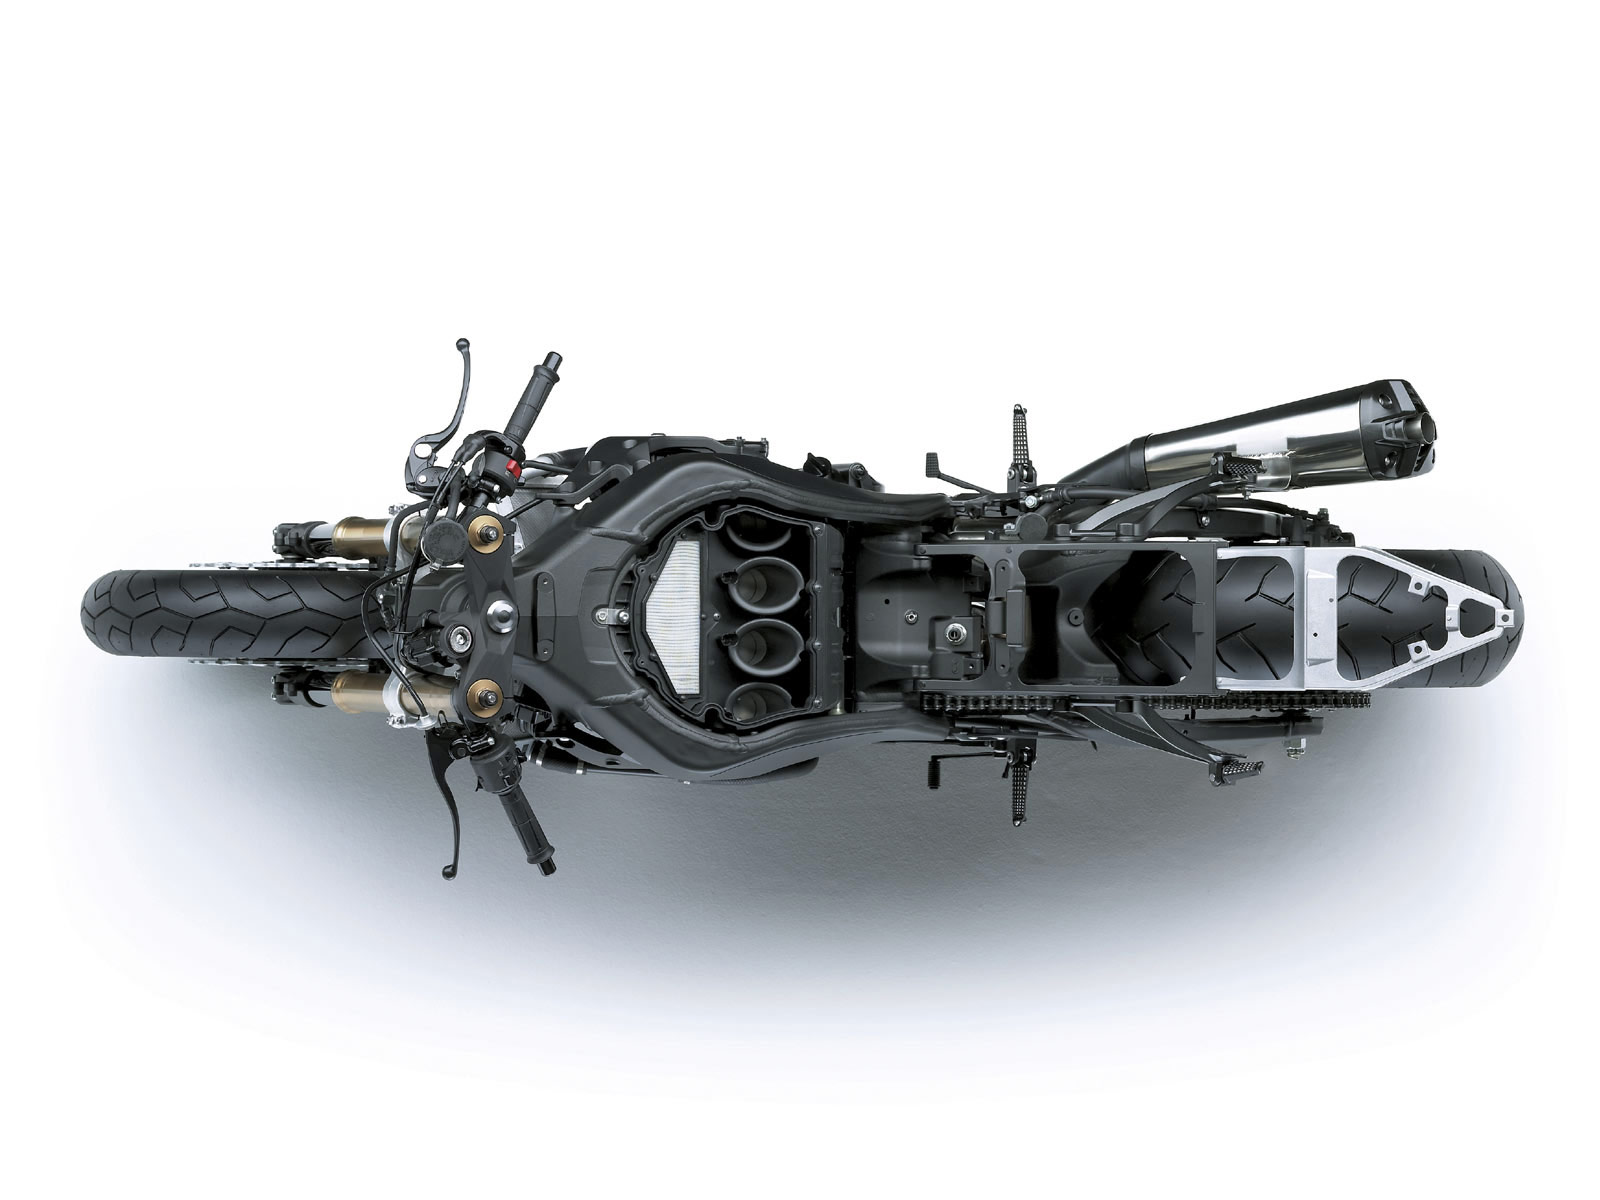 Gambar Motor Kawasaki Ninja Zx 10r 2008 Specs